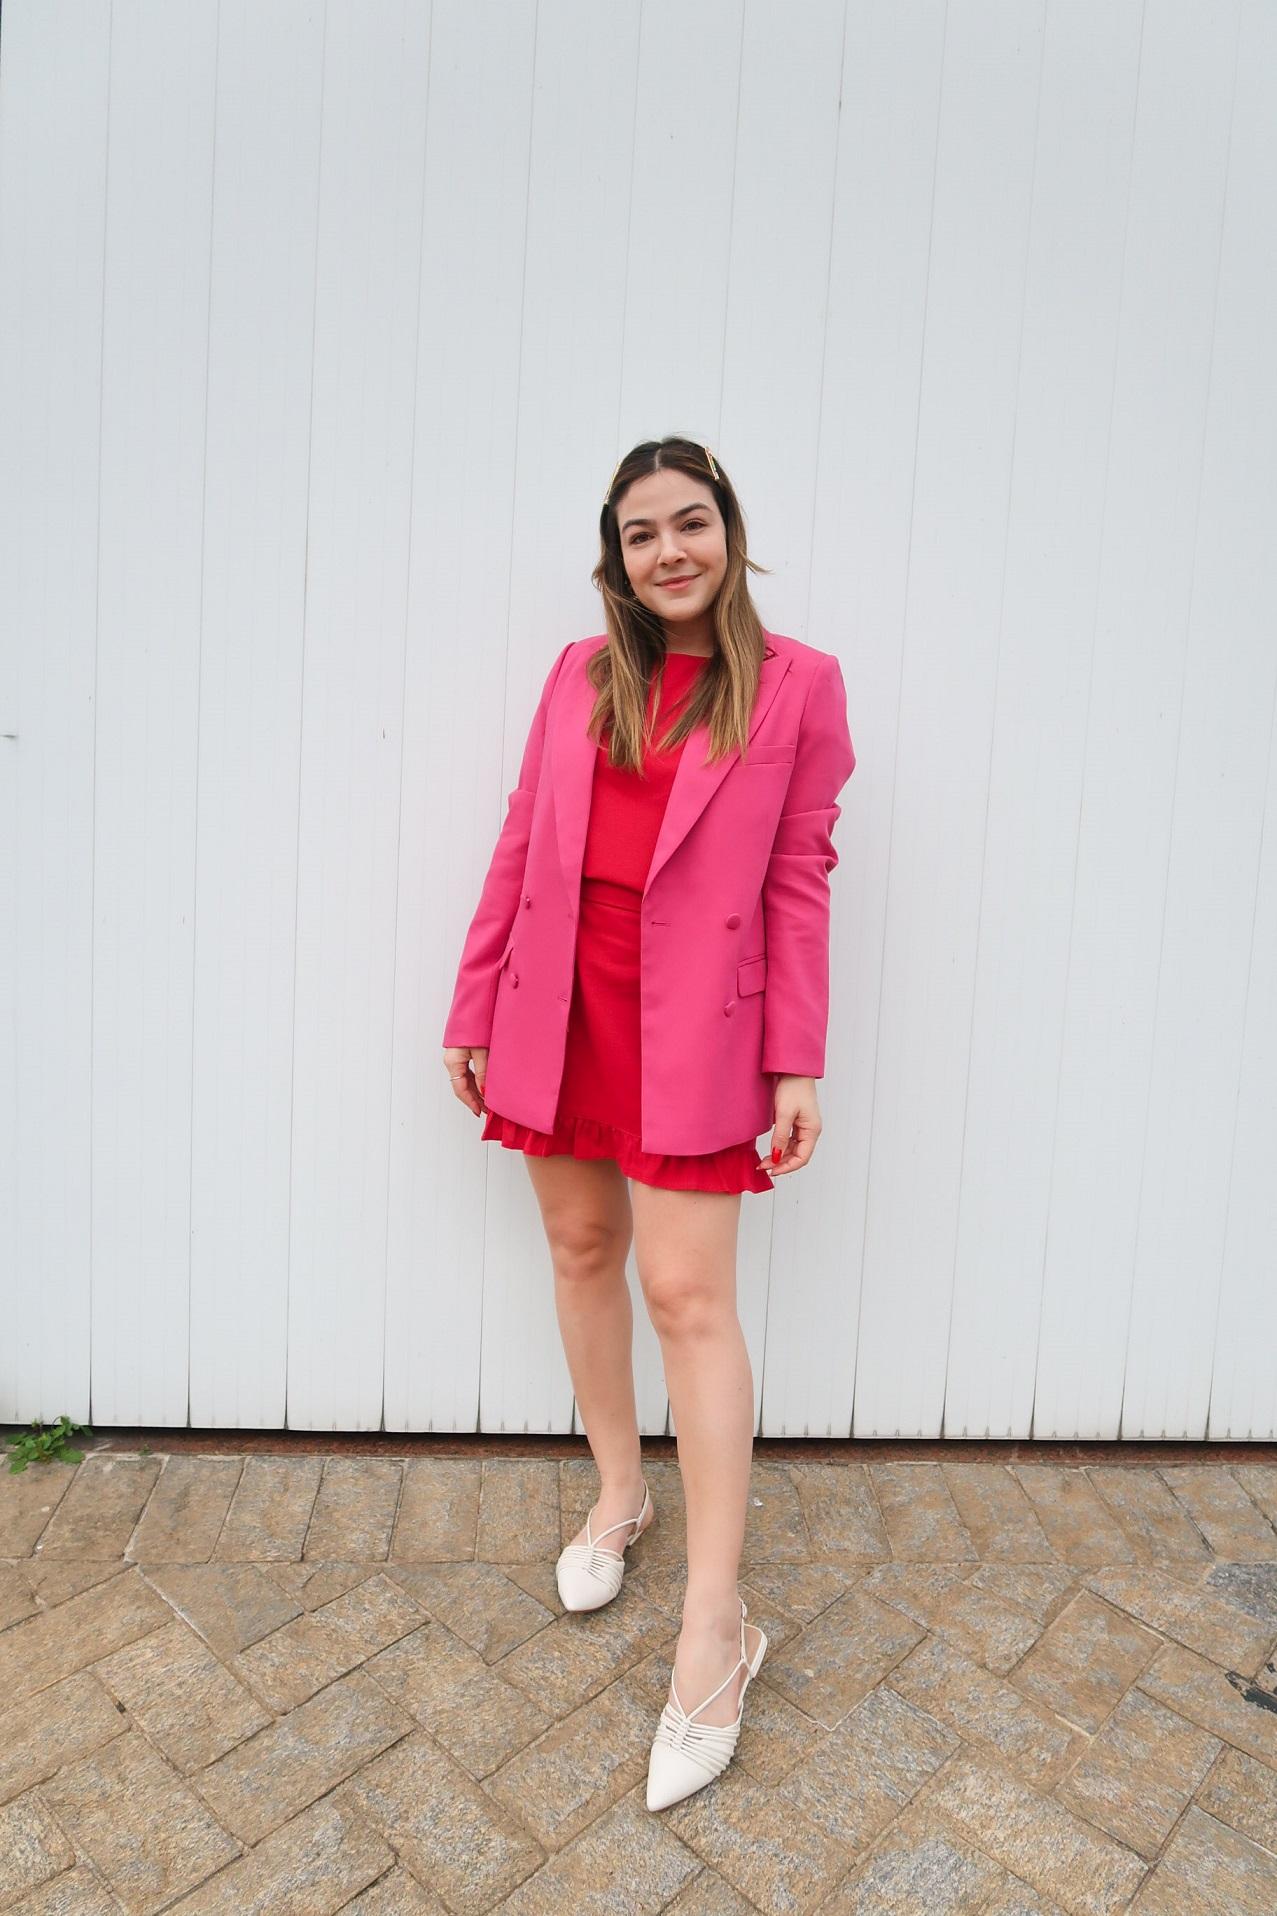 blazer alongado rosa, blazer alongado, blazer rosa, blazer amaro, amaro, sapatilha off white, vestido linho, vestido vermelho, Look Blazer Rosa Vestido Vermelho